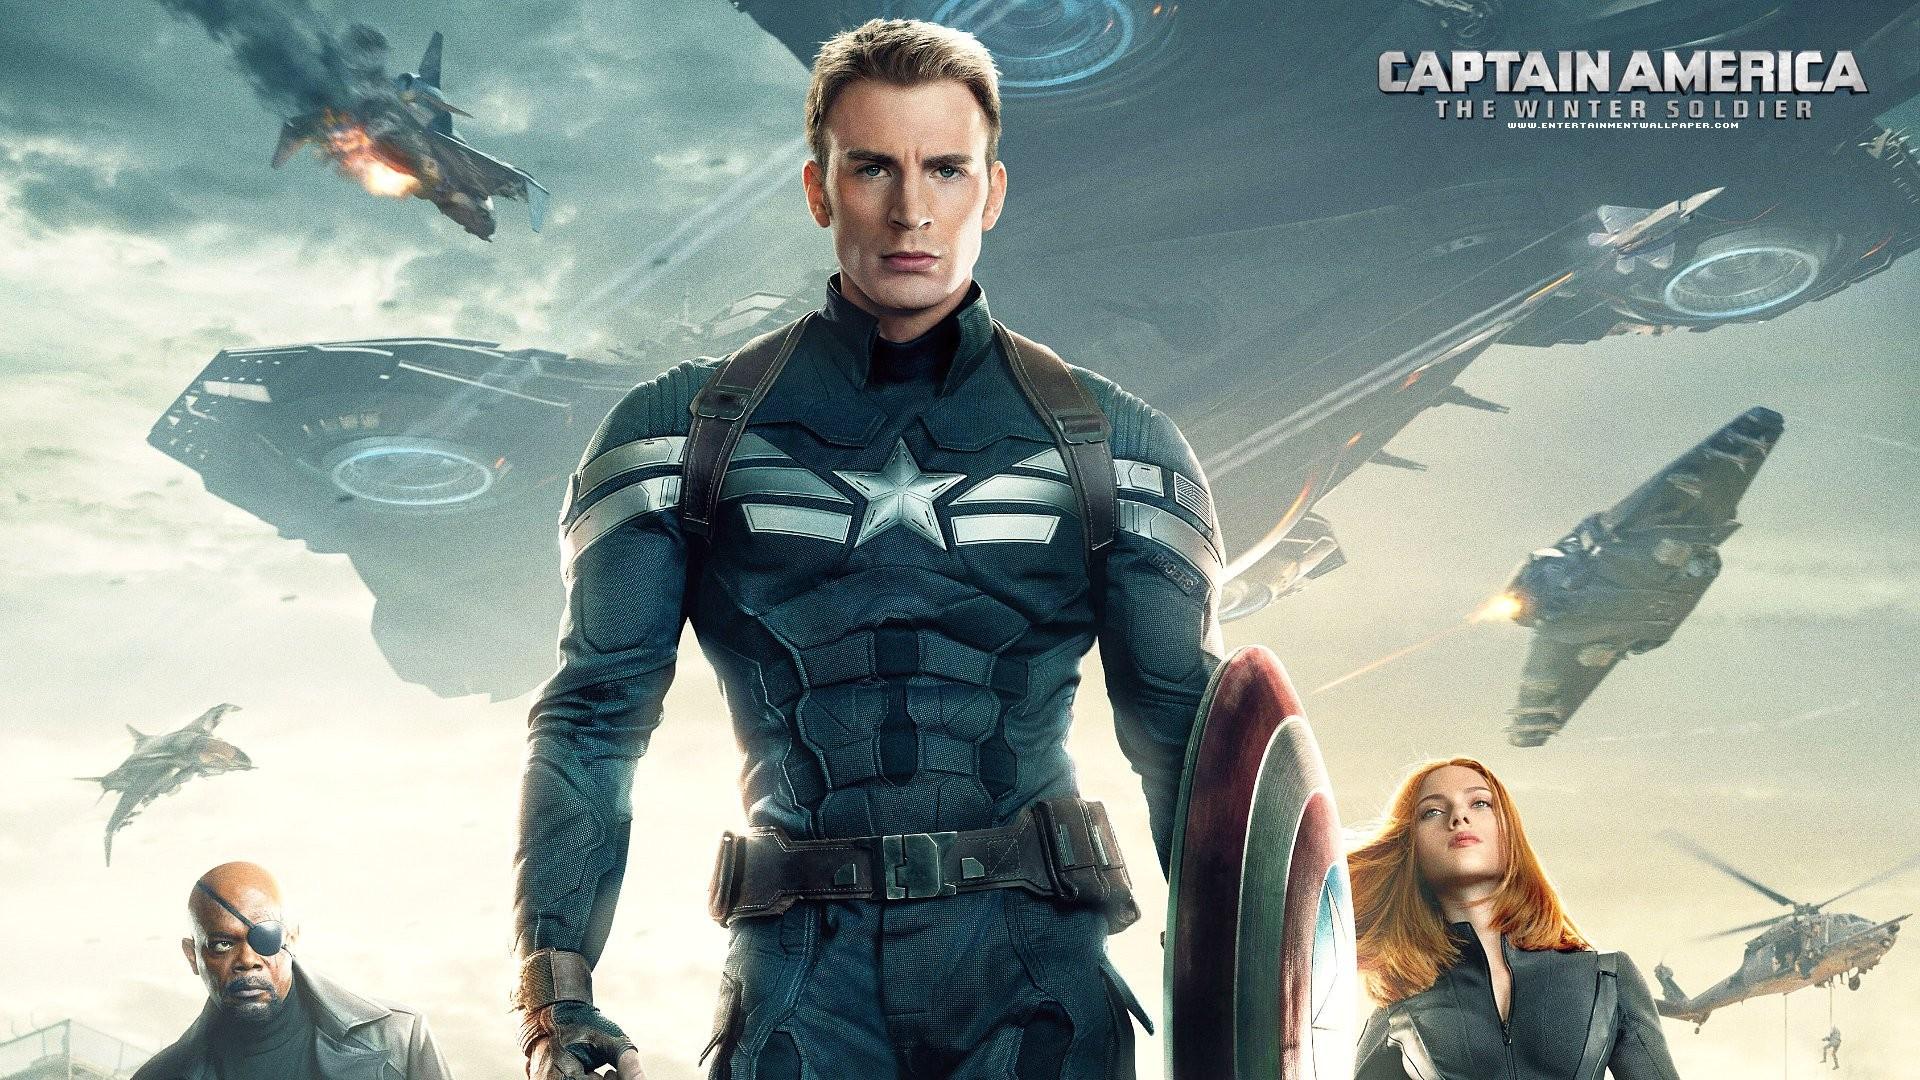 General 1920x1080 Captain America: The Winter Soldier Samuel L. Jackson Chris Evans Scarlett Johansson Nick Fury Captain America Black Widow